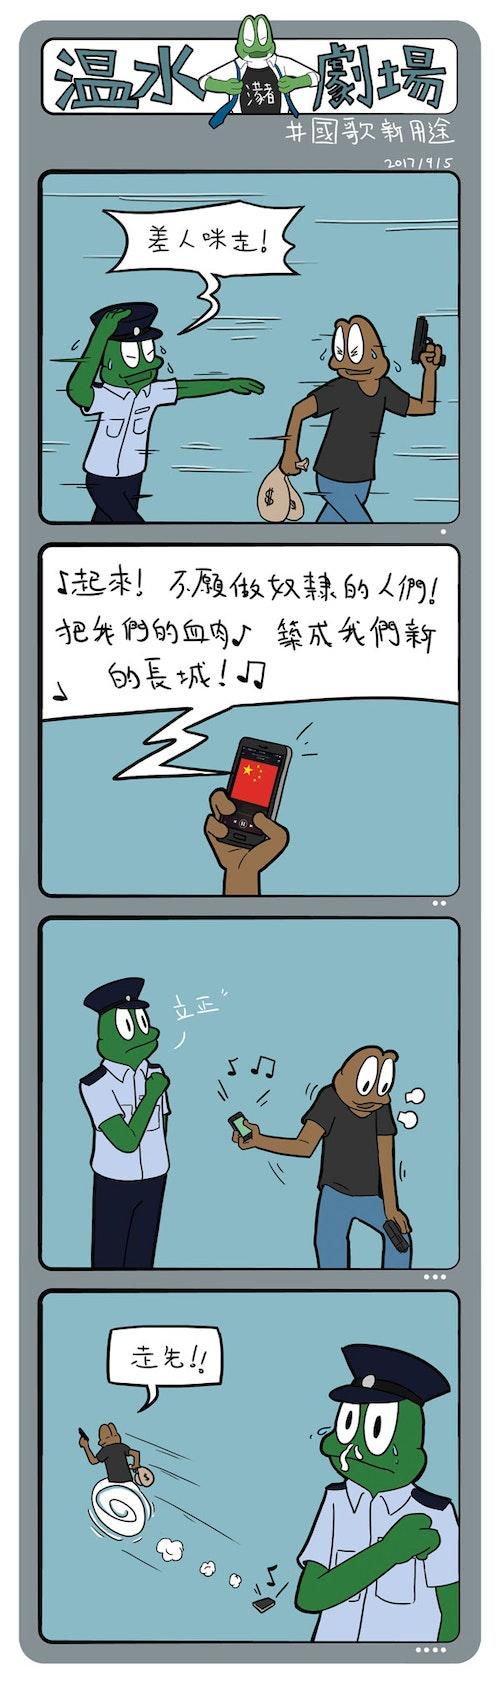 frog_news_lens_116_522